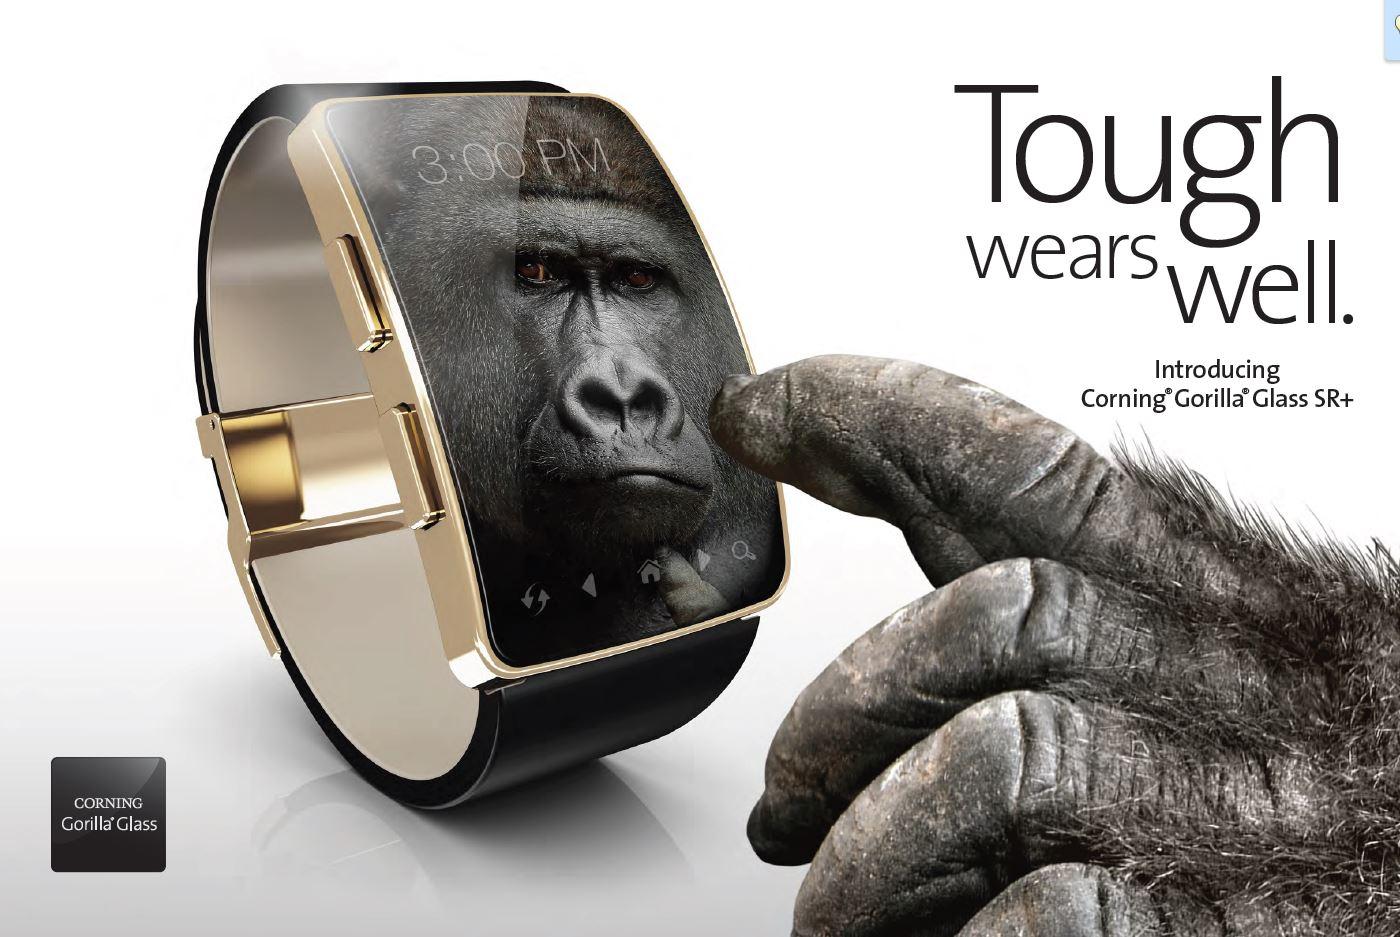 Corning gorilla glass 3 review